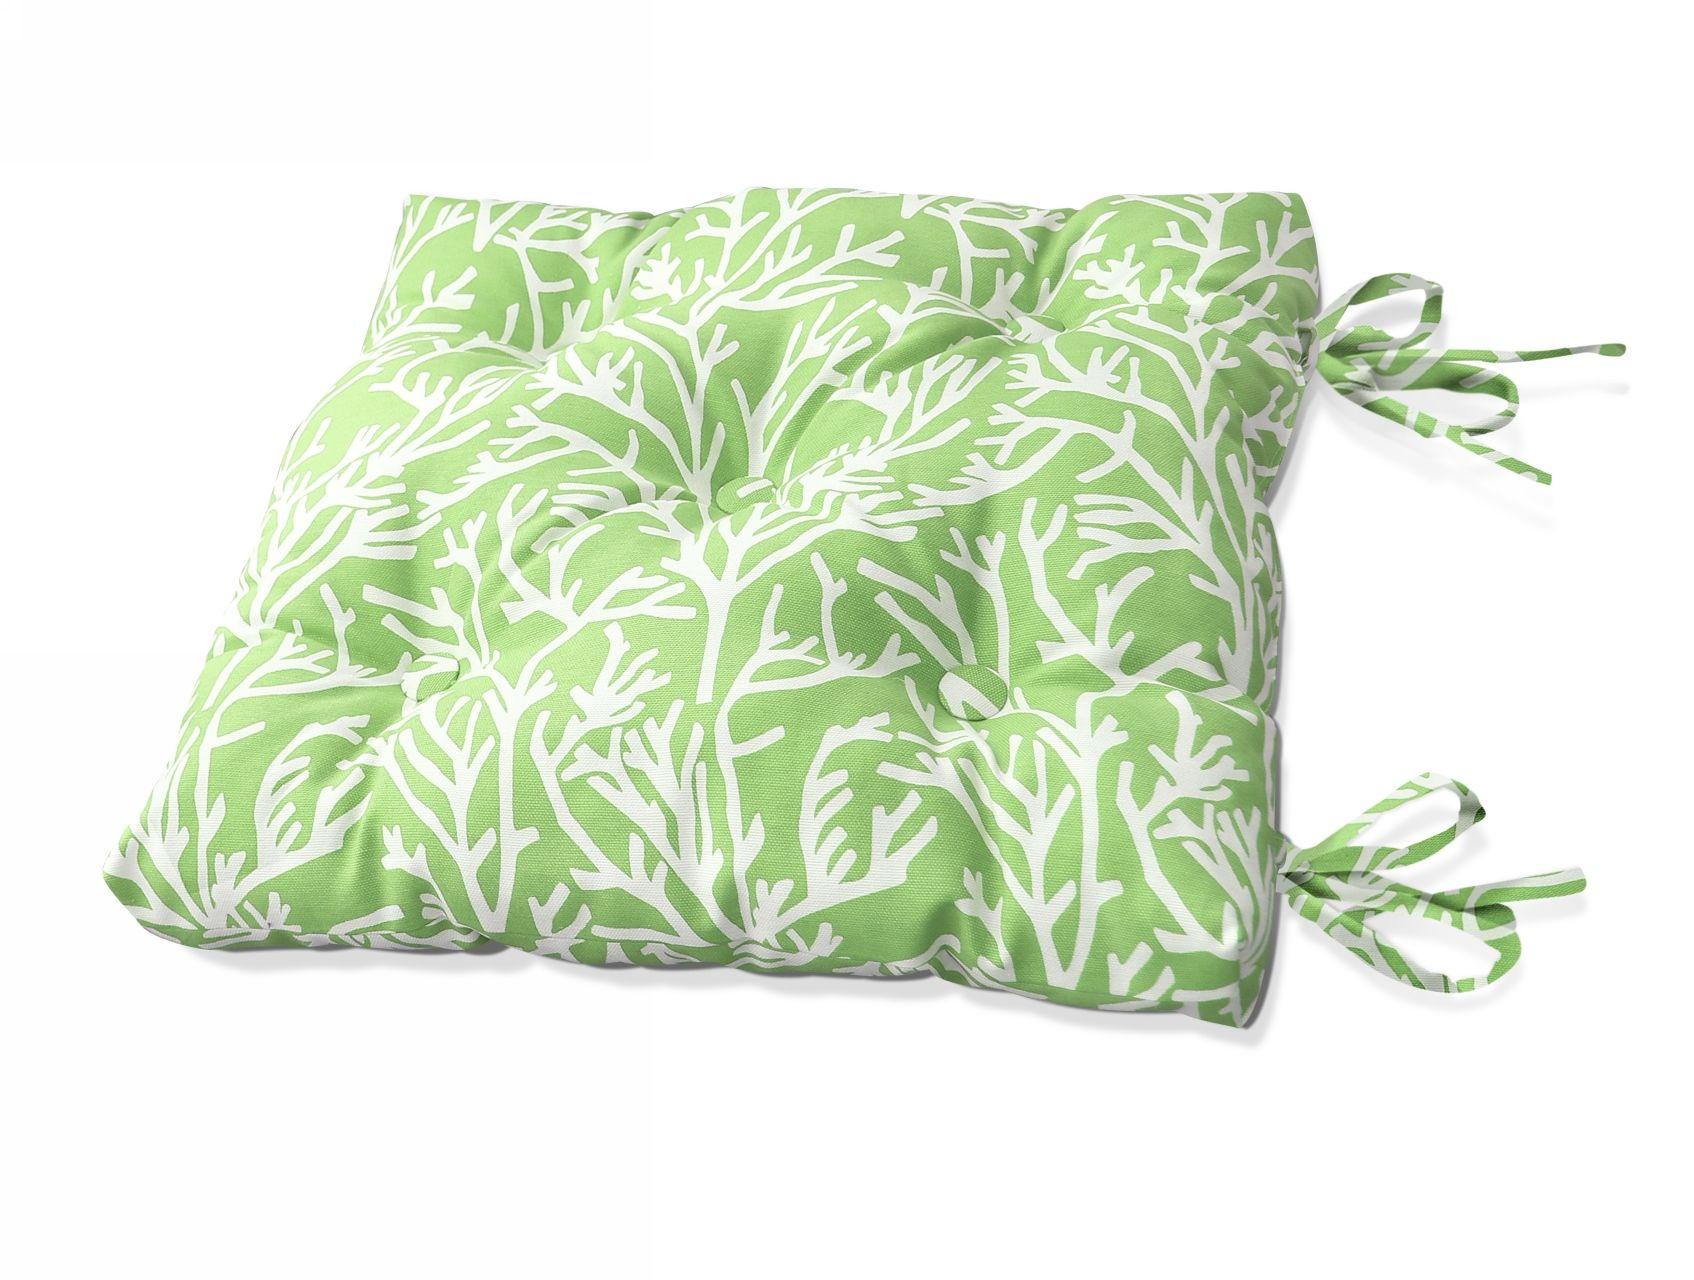 Подушки на стул Kauffort Подушка на стул Corals Цвет: Зеленый (40х40) подушка на стул арти м райский сад